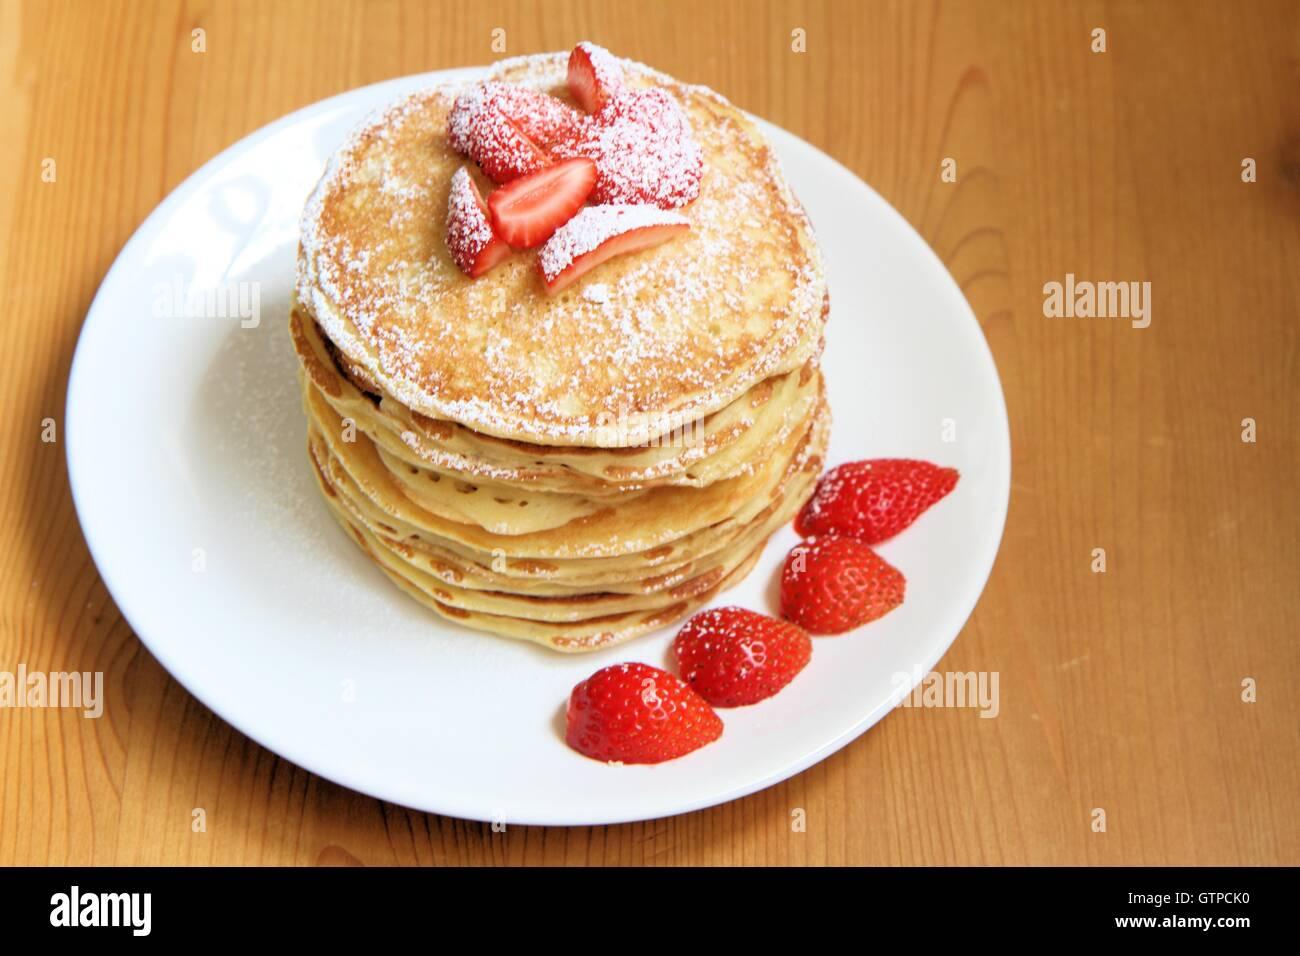 Strawberry pancakes - Stock Image